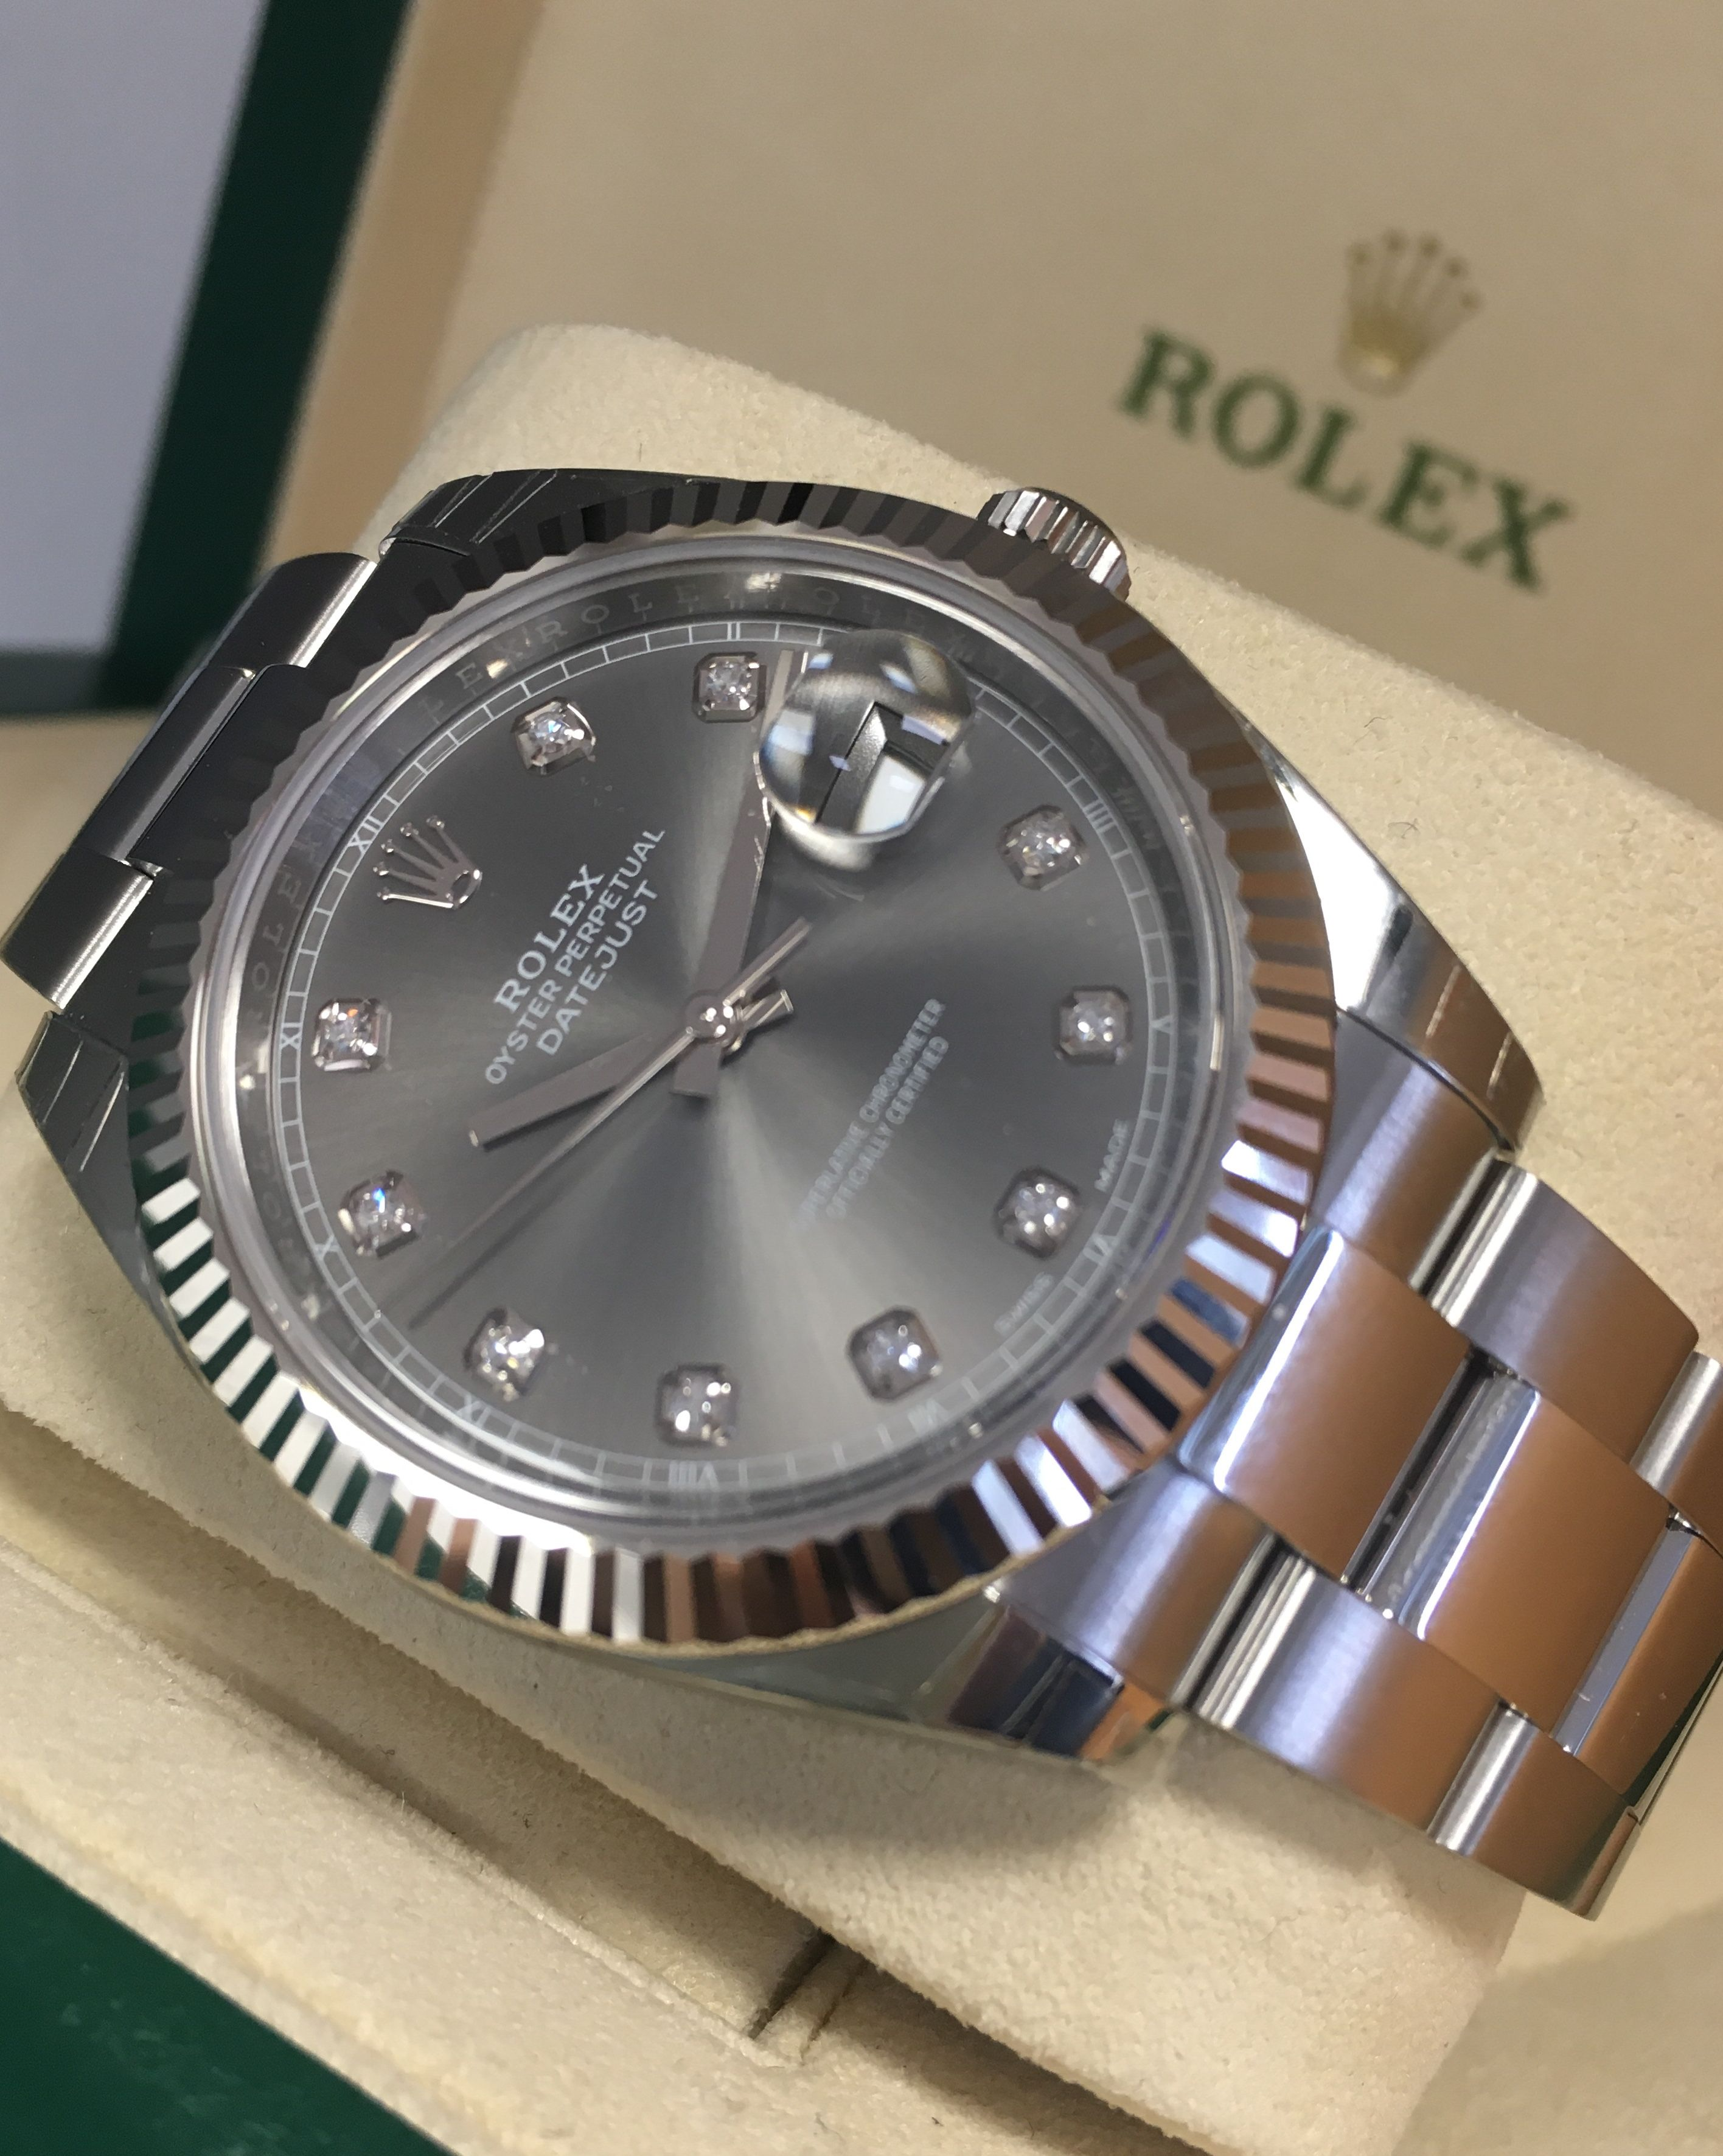 b9b7c7997665 Rolex Datejust 41 Rhodium Diamond Dial 126334